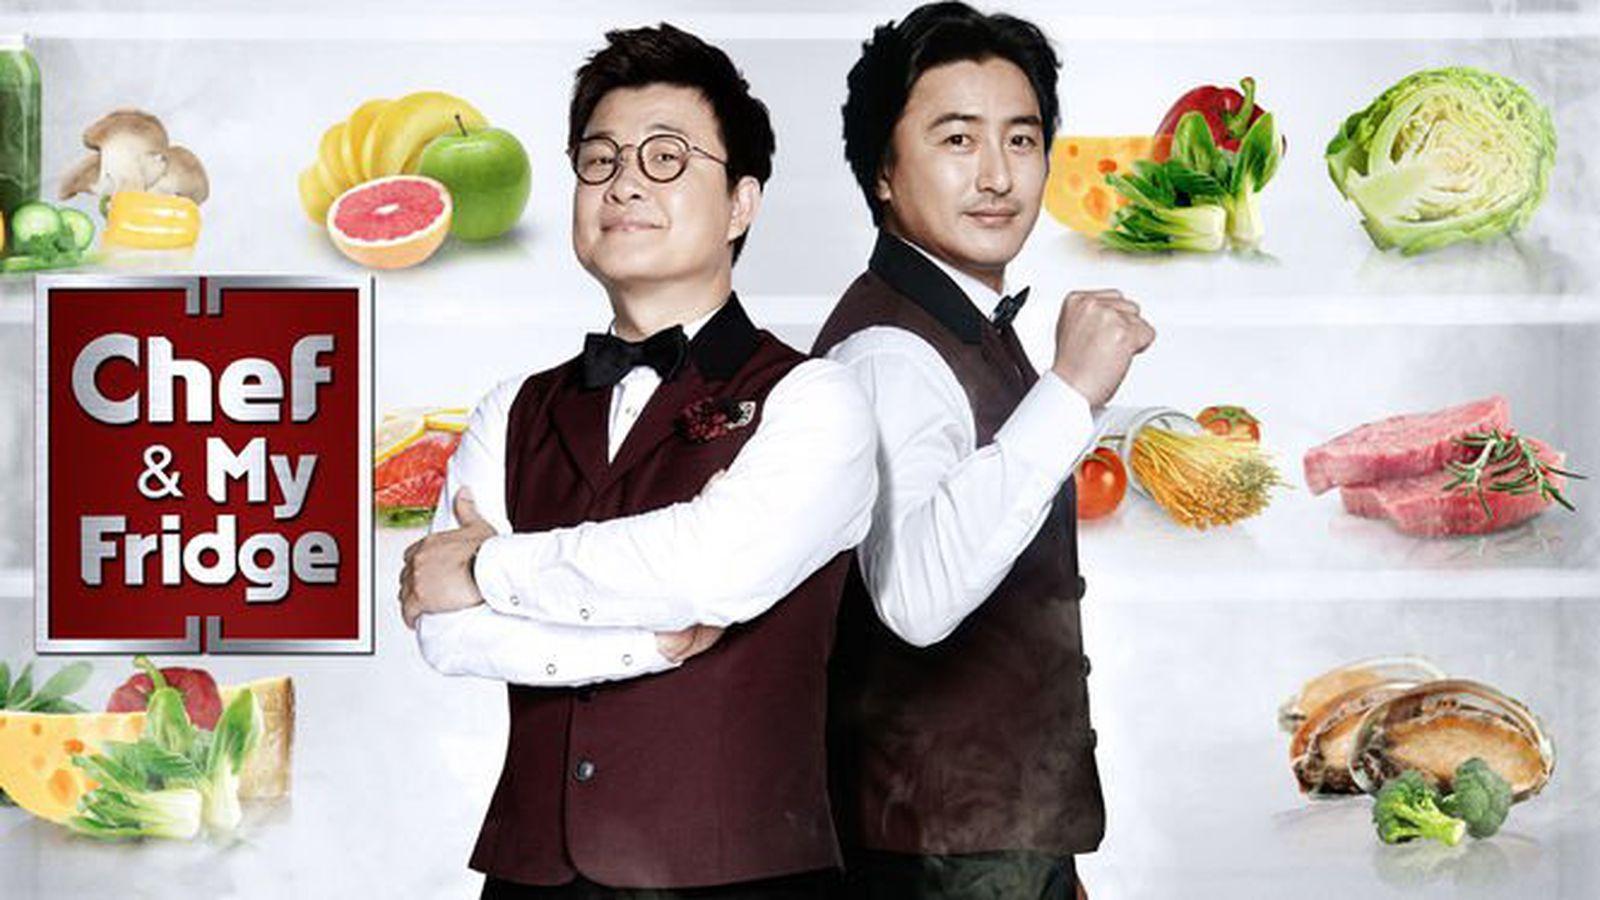 Mejores series de comida - Chef and my fridge